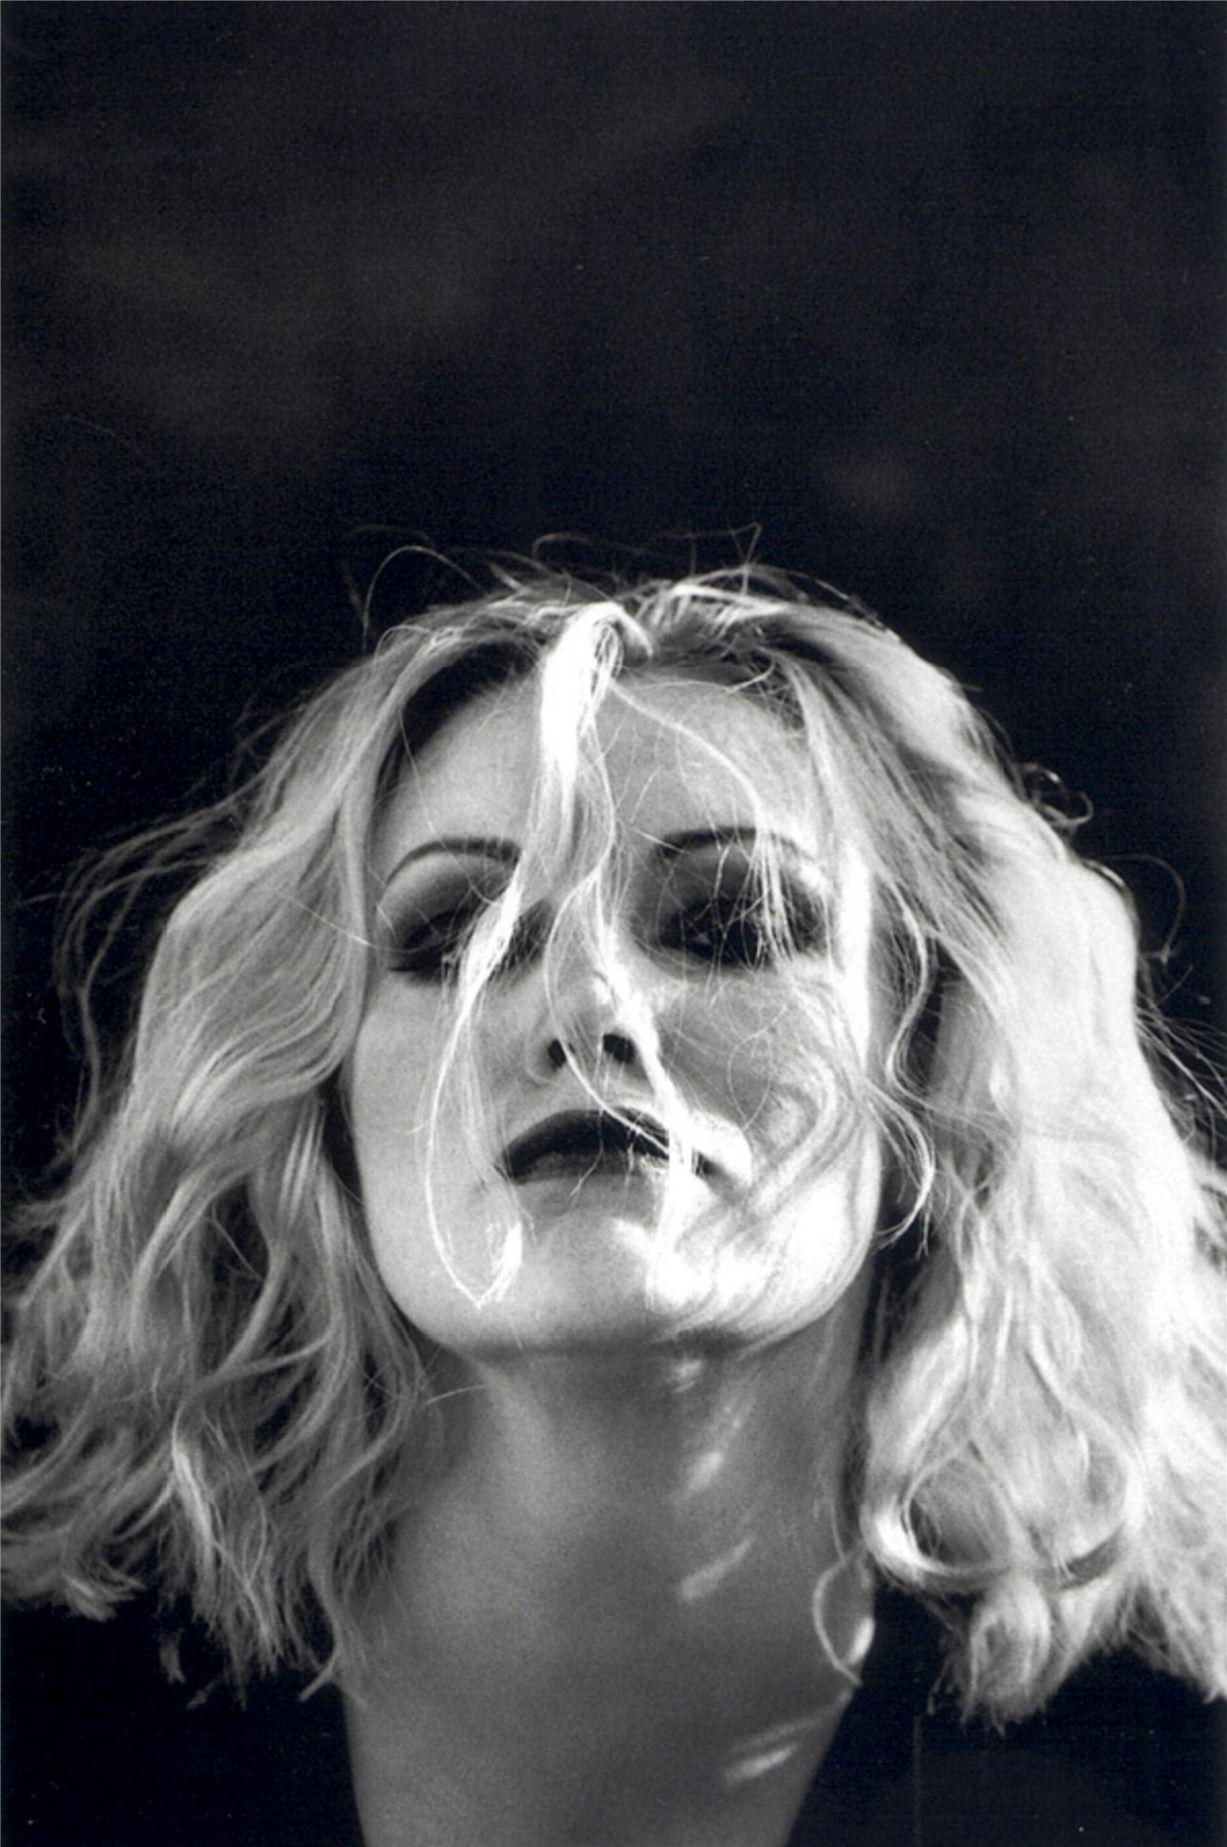 Cathy Moriarty / Кэти Мориарти - портрет фотографа Грега Гормана / Greg Gorman